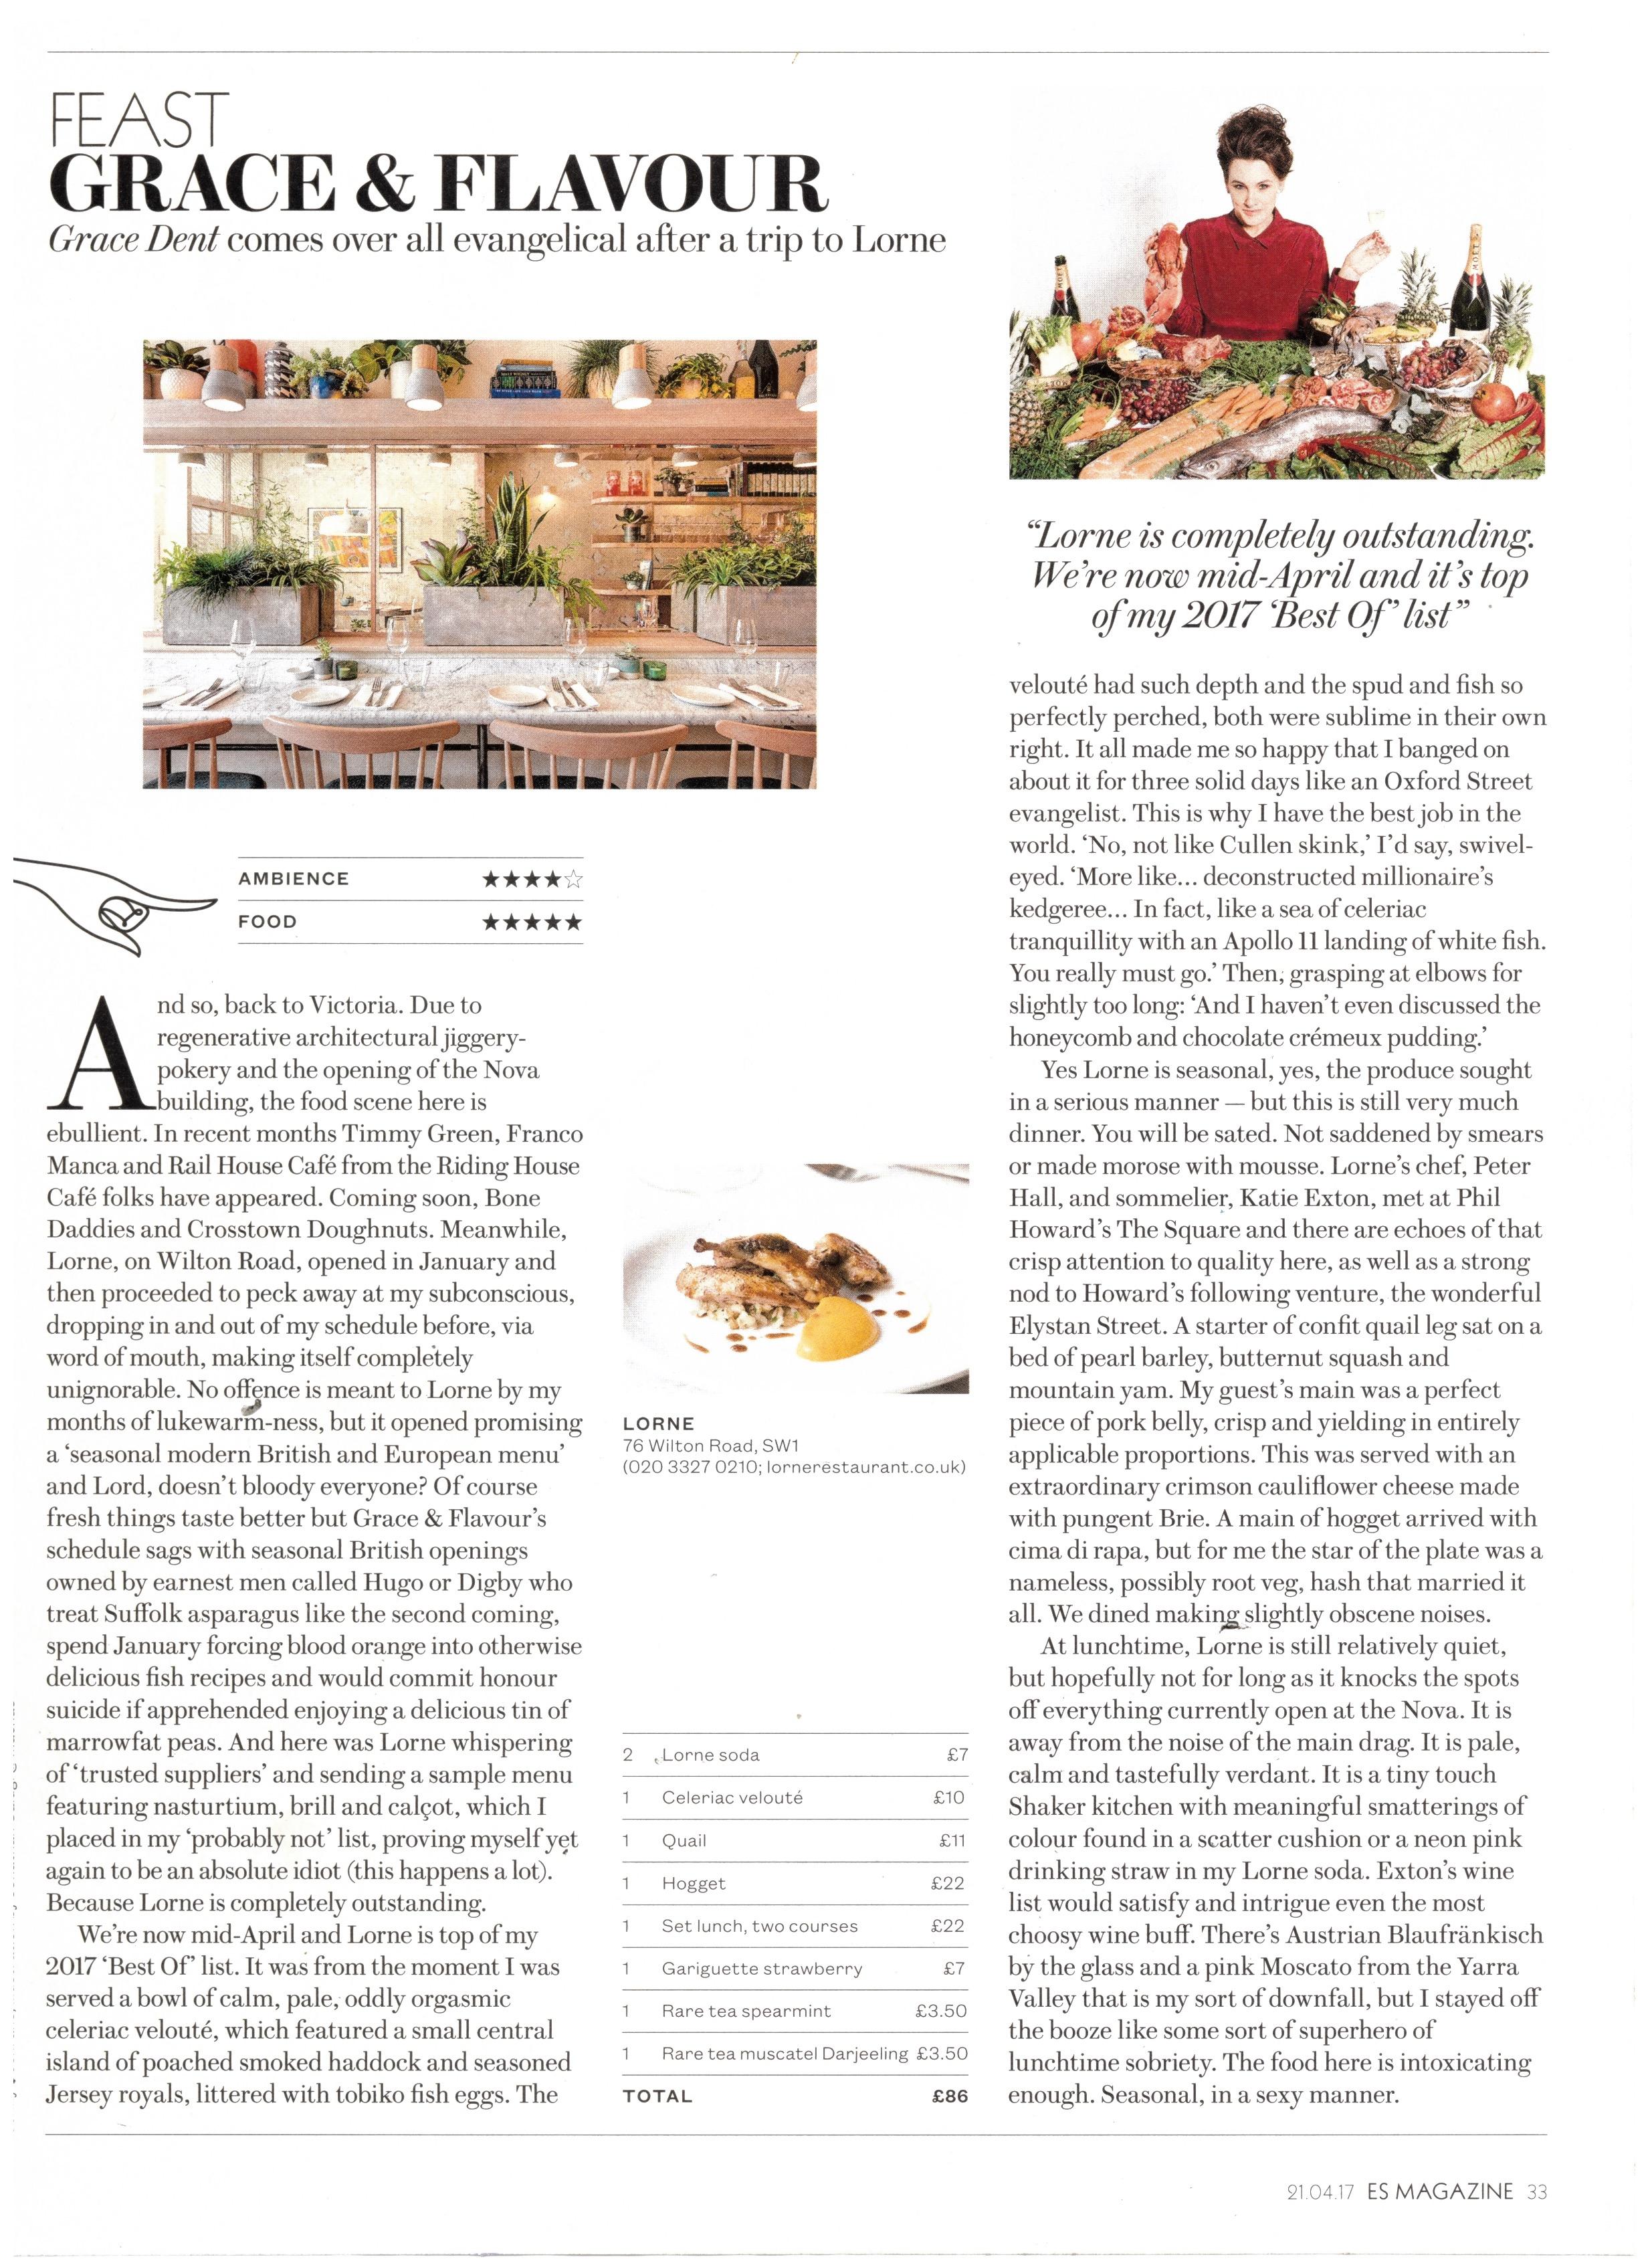 ES Magazine 21.04.17.jpeg